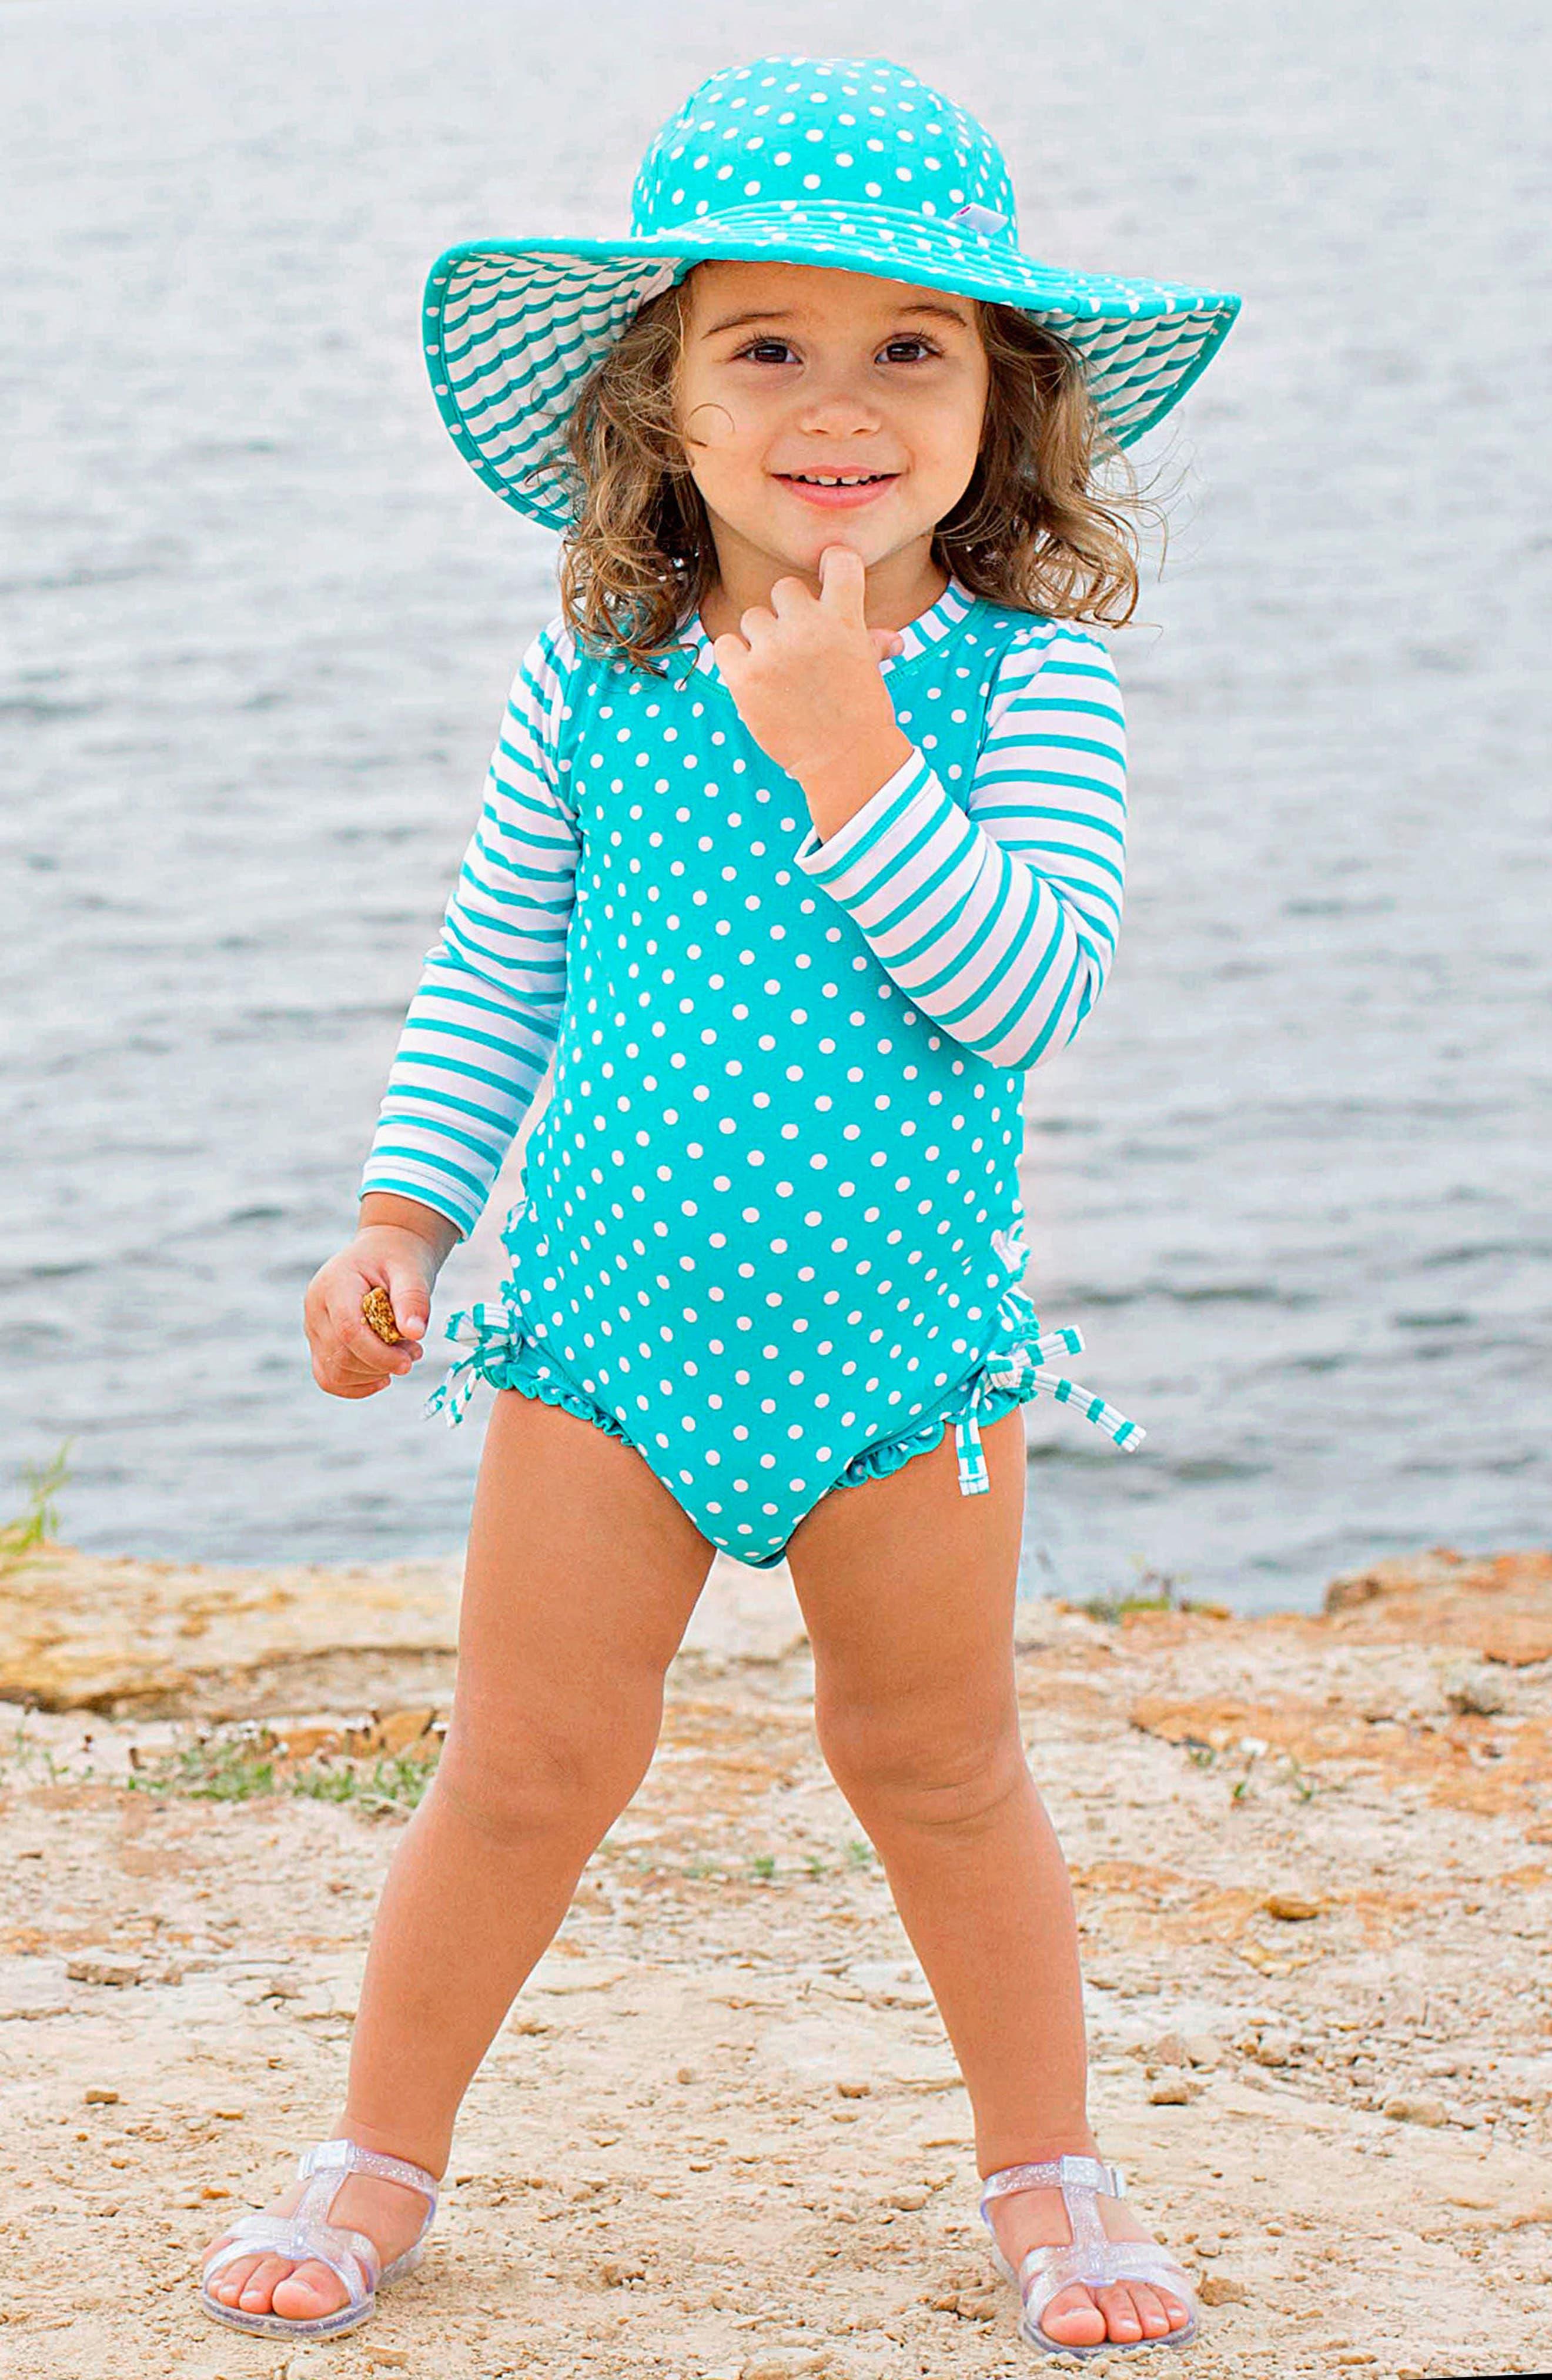 Alternate Image 3  - RuffleButts One-Piece Rashguard Swimsuit & Hat Set (Baby Girls)